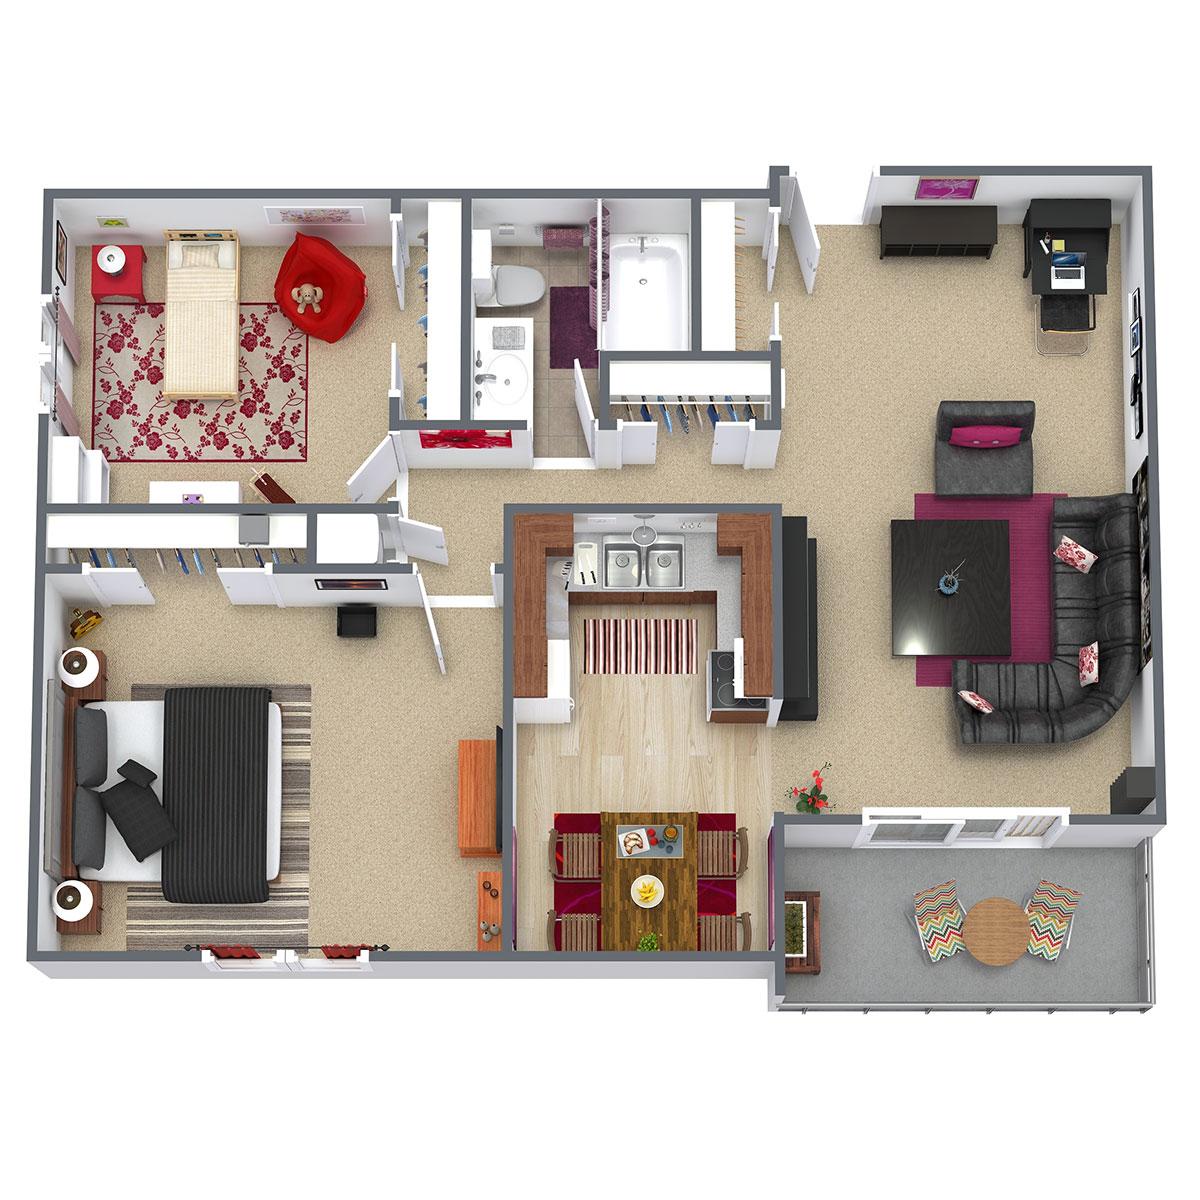 Floorplan - 2 Bed/1 Bath - Updated image